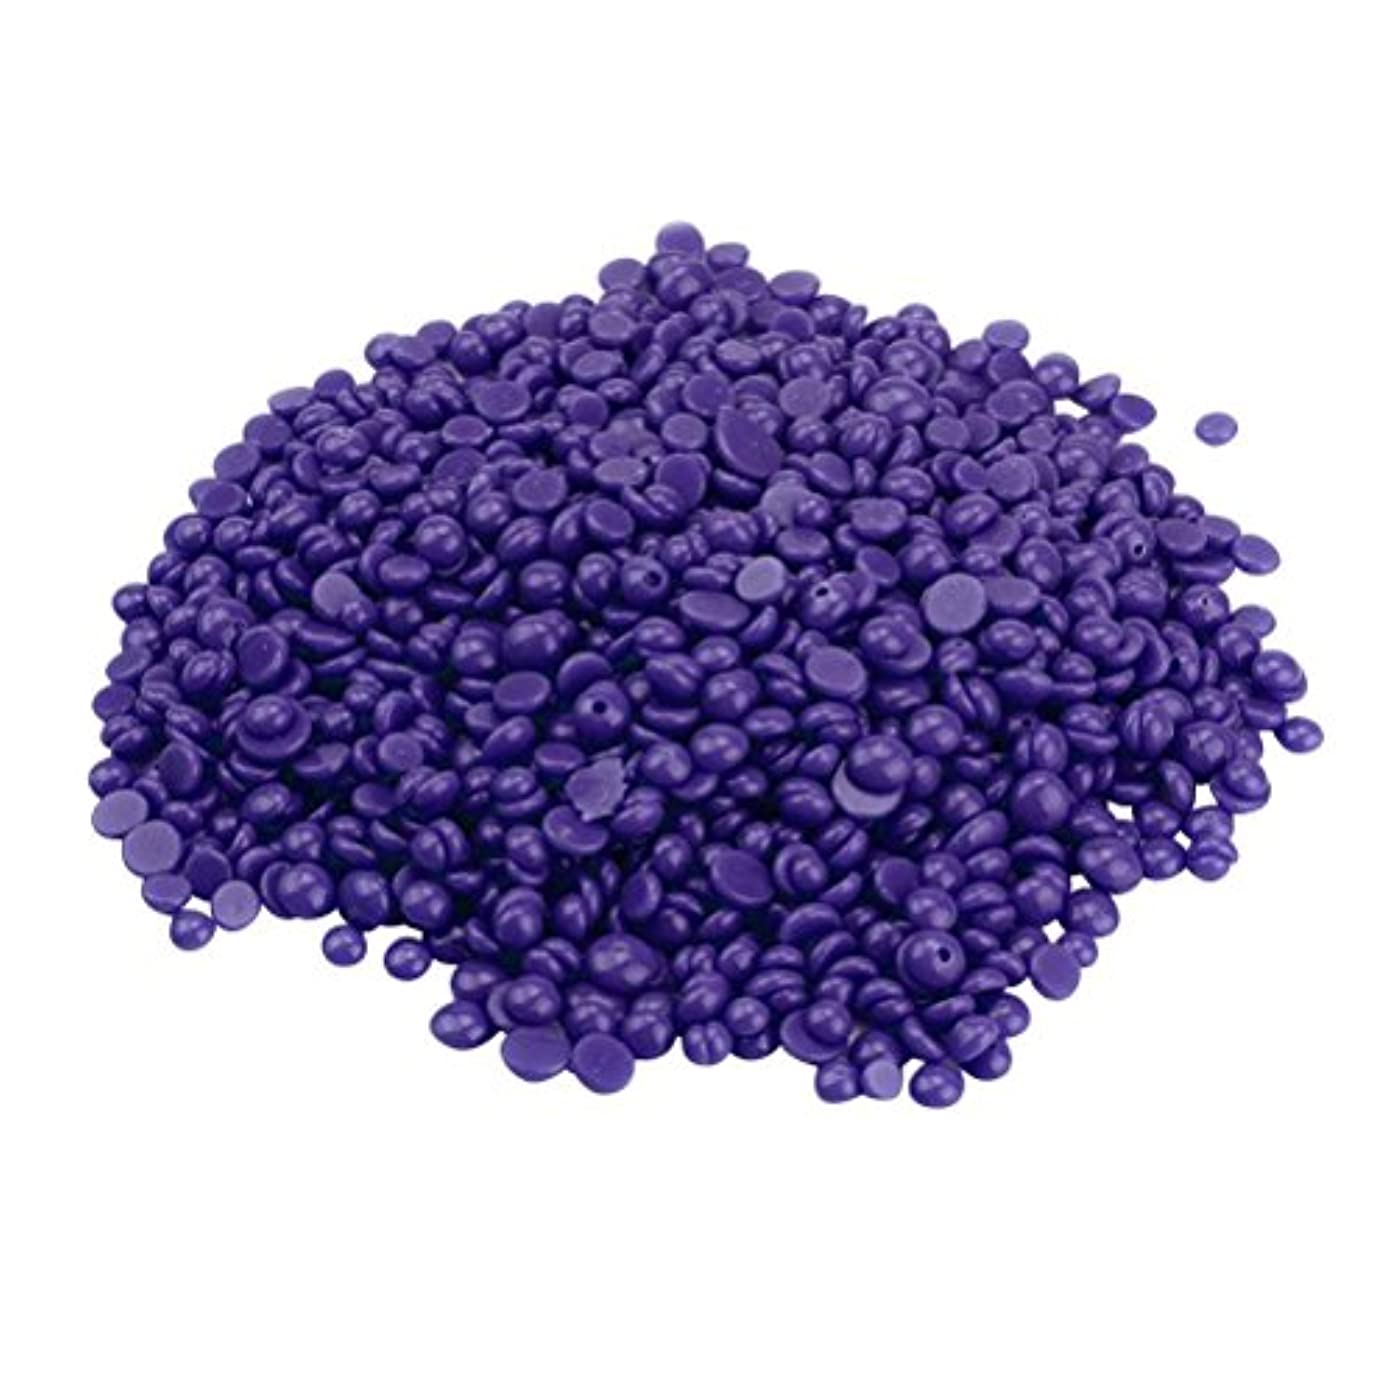 ROSENICE ハードワックス豆 脚の脱毛 いいえストリップ脱揮発性のパール 辛い 脱毛 400g(紫の)